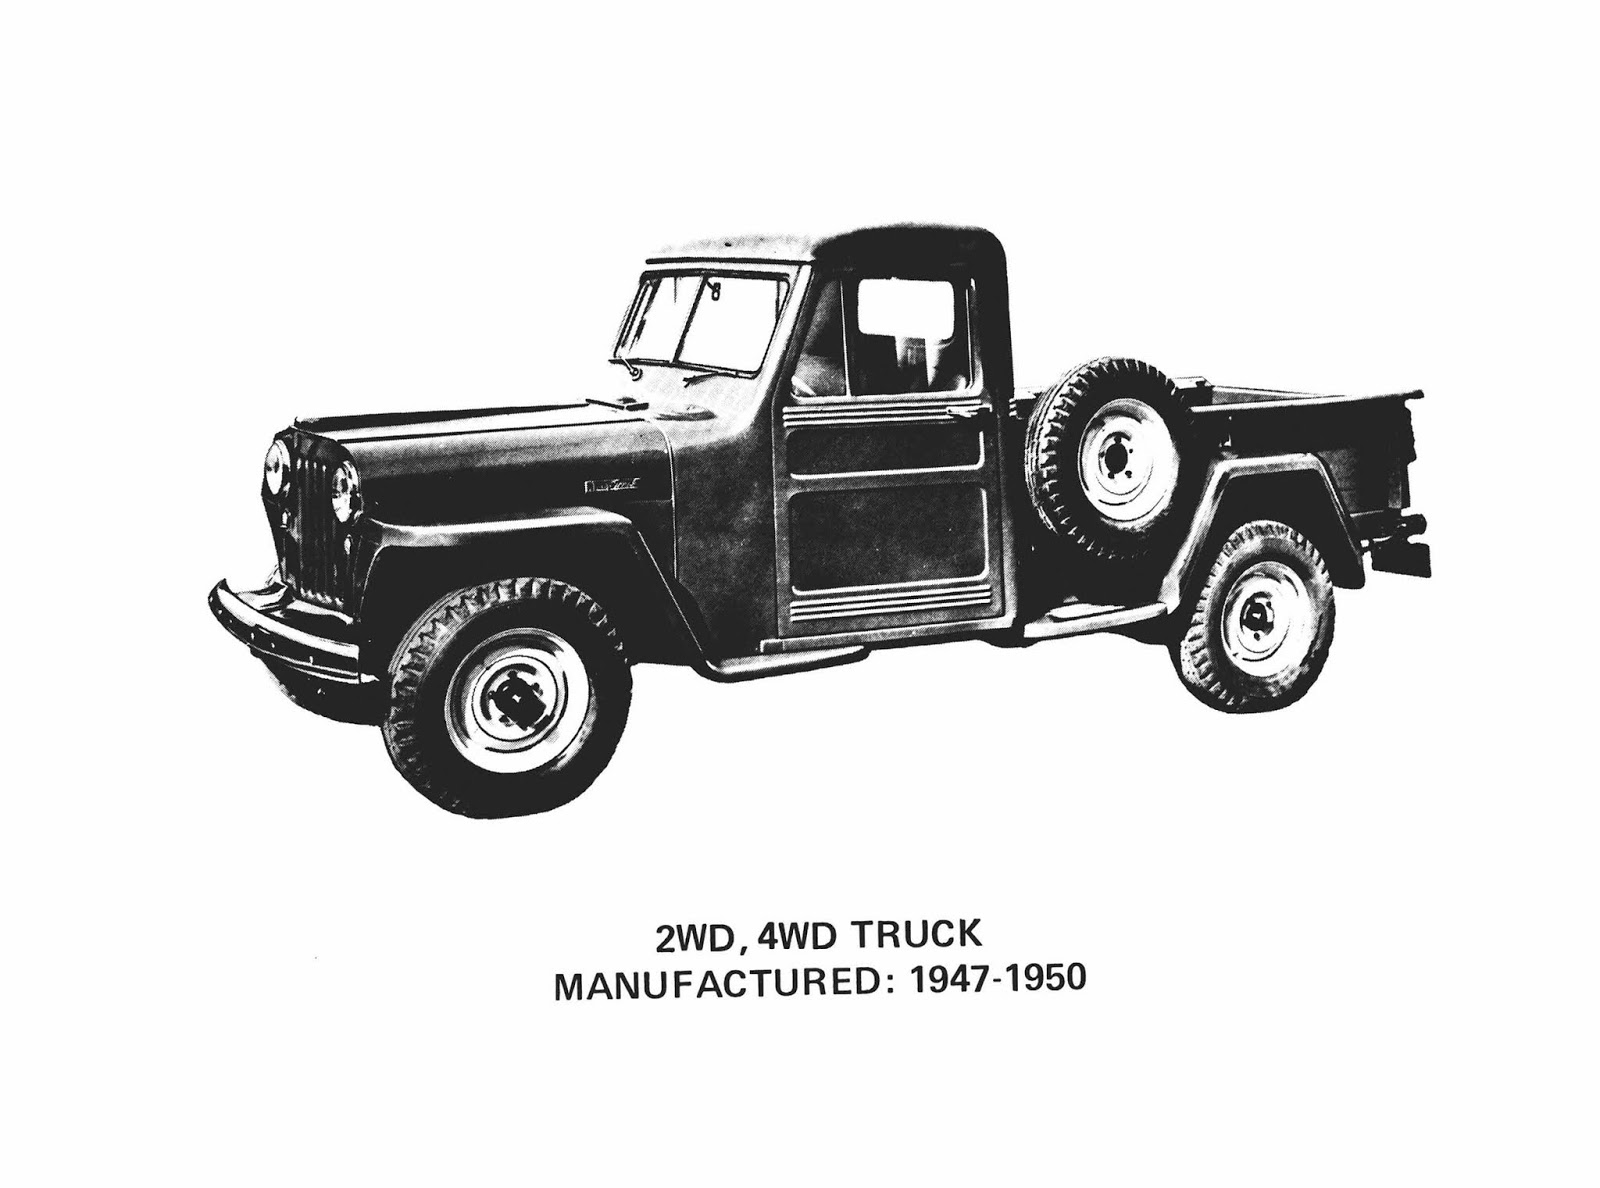 1947jeeeppickuptruck 6037876e389db To Jeep Gladiator, έρχεται να αλλάξει τα δεδομένα στην κατηγορία των pick-up Gladiator, Jeep, Jeep Gladiator, zblog, ειδήσεις